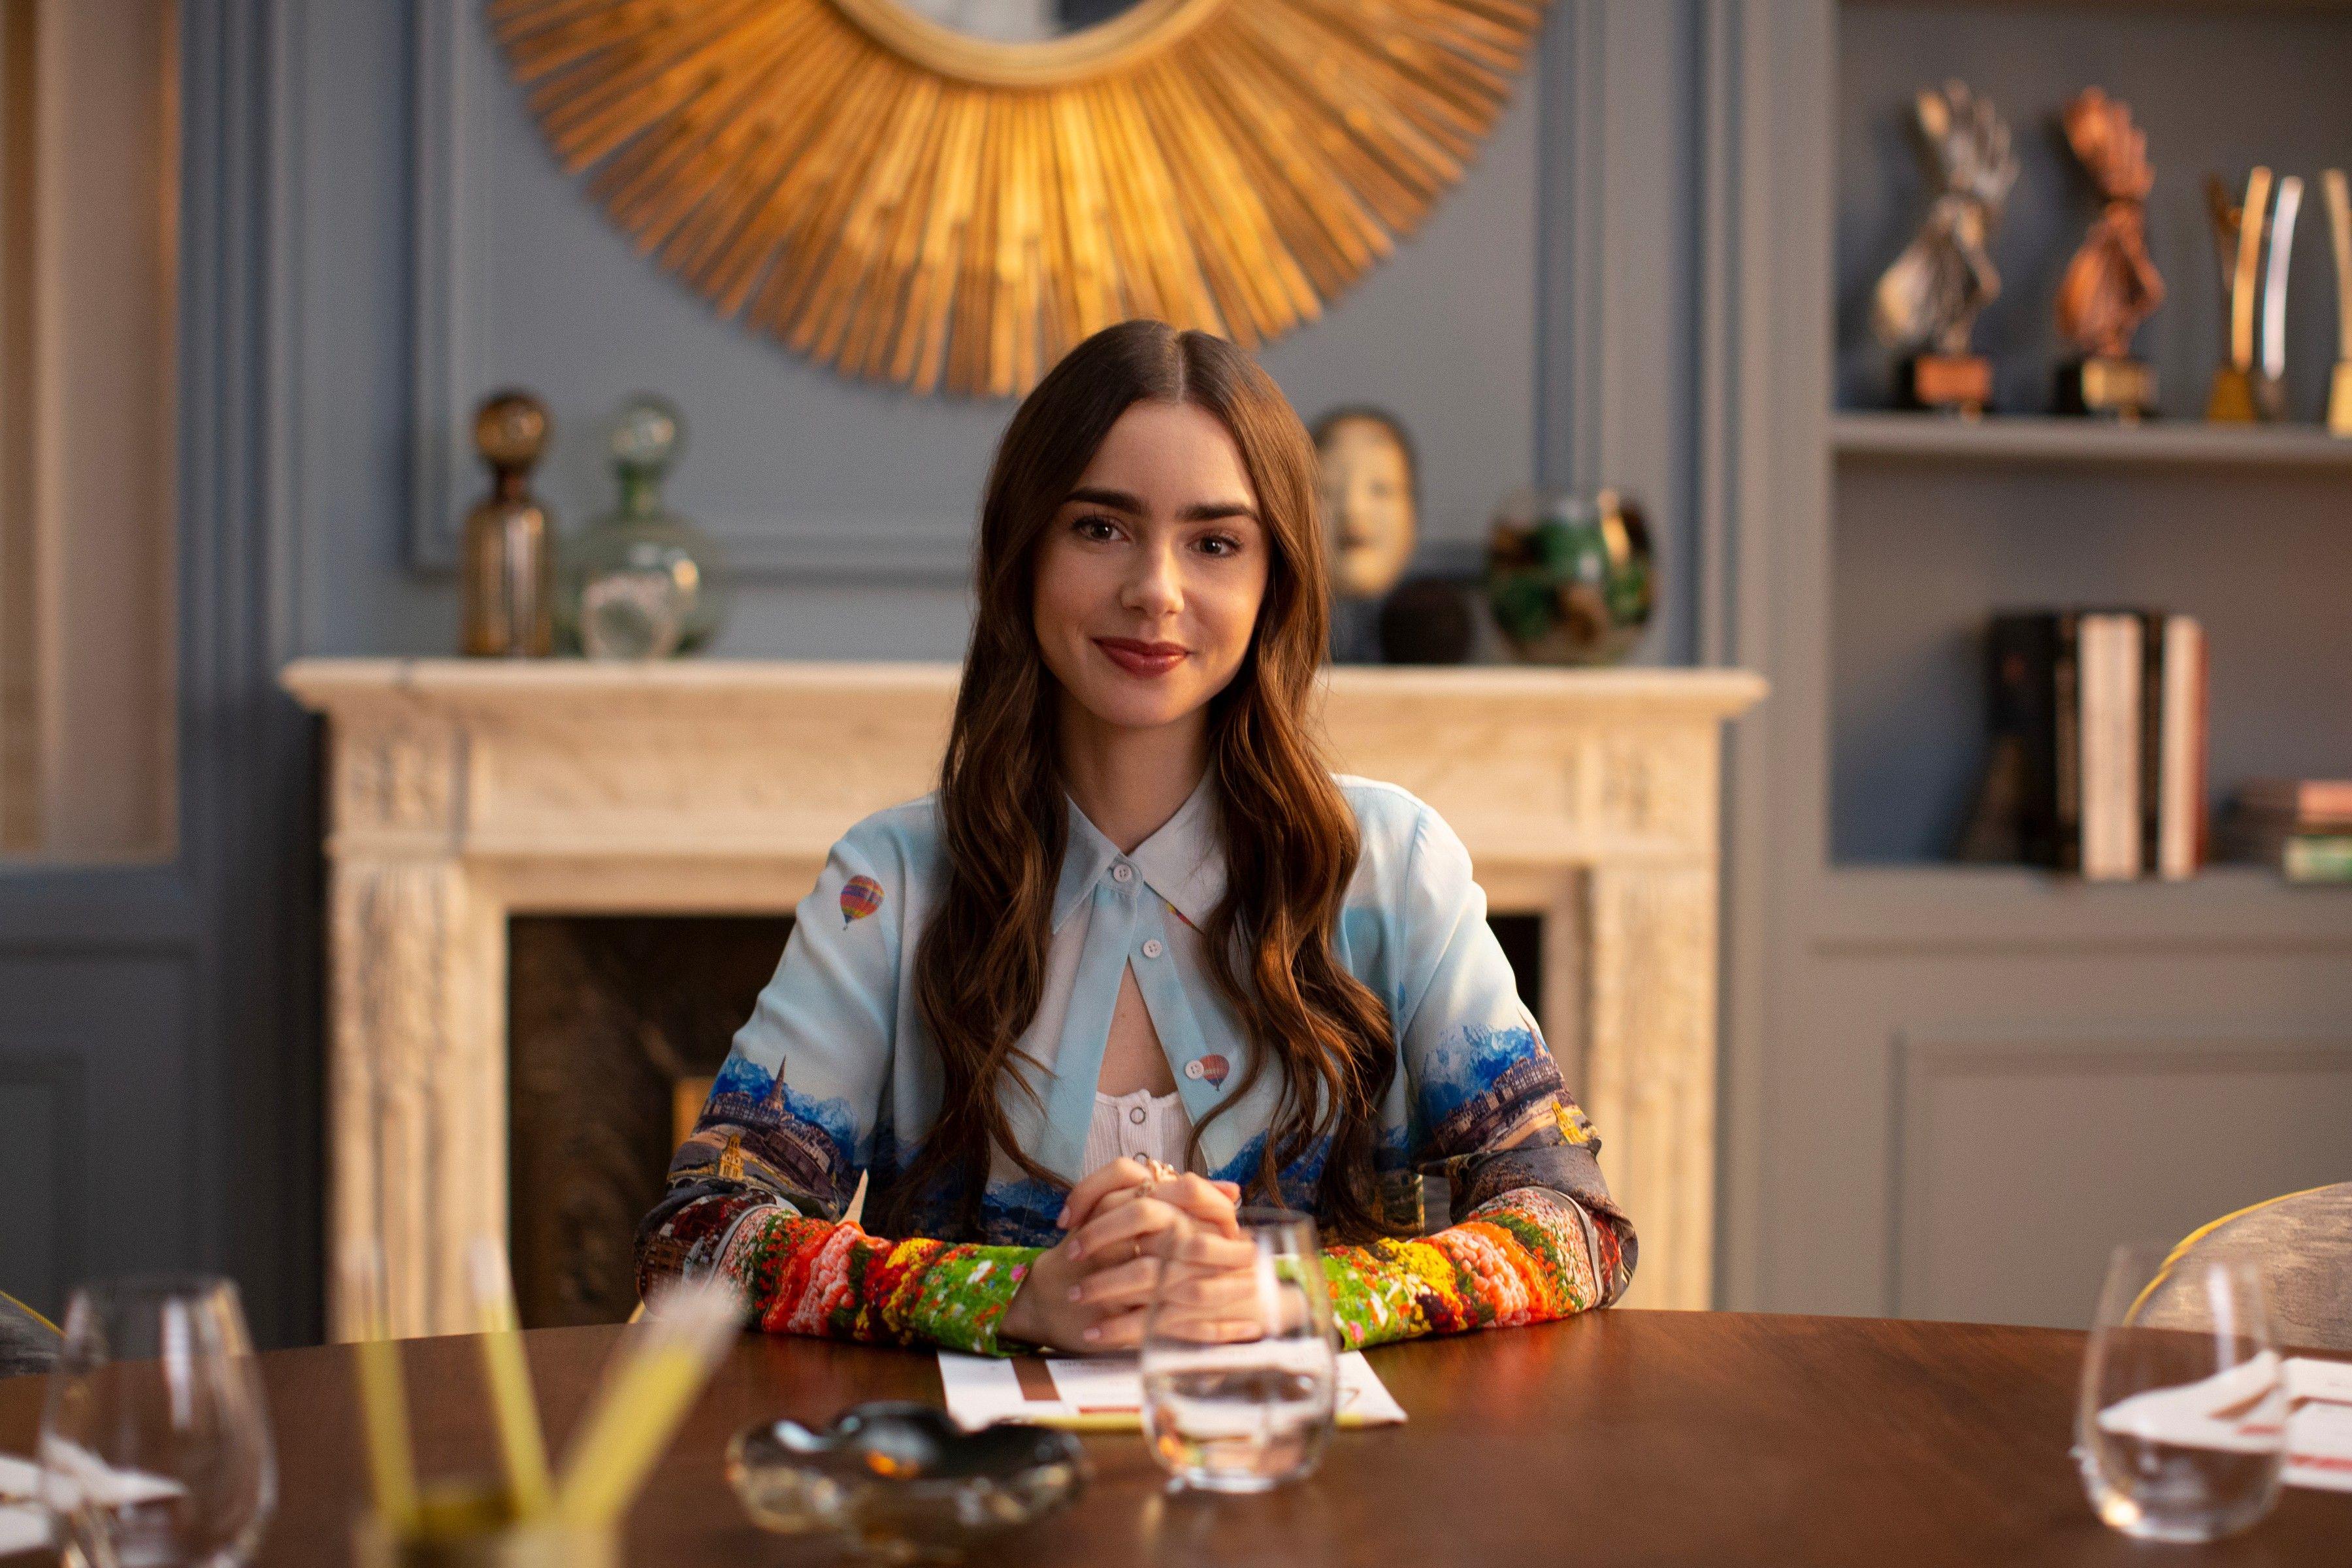 Confirmado: Emily en Paris tendrá segunda temporada